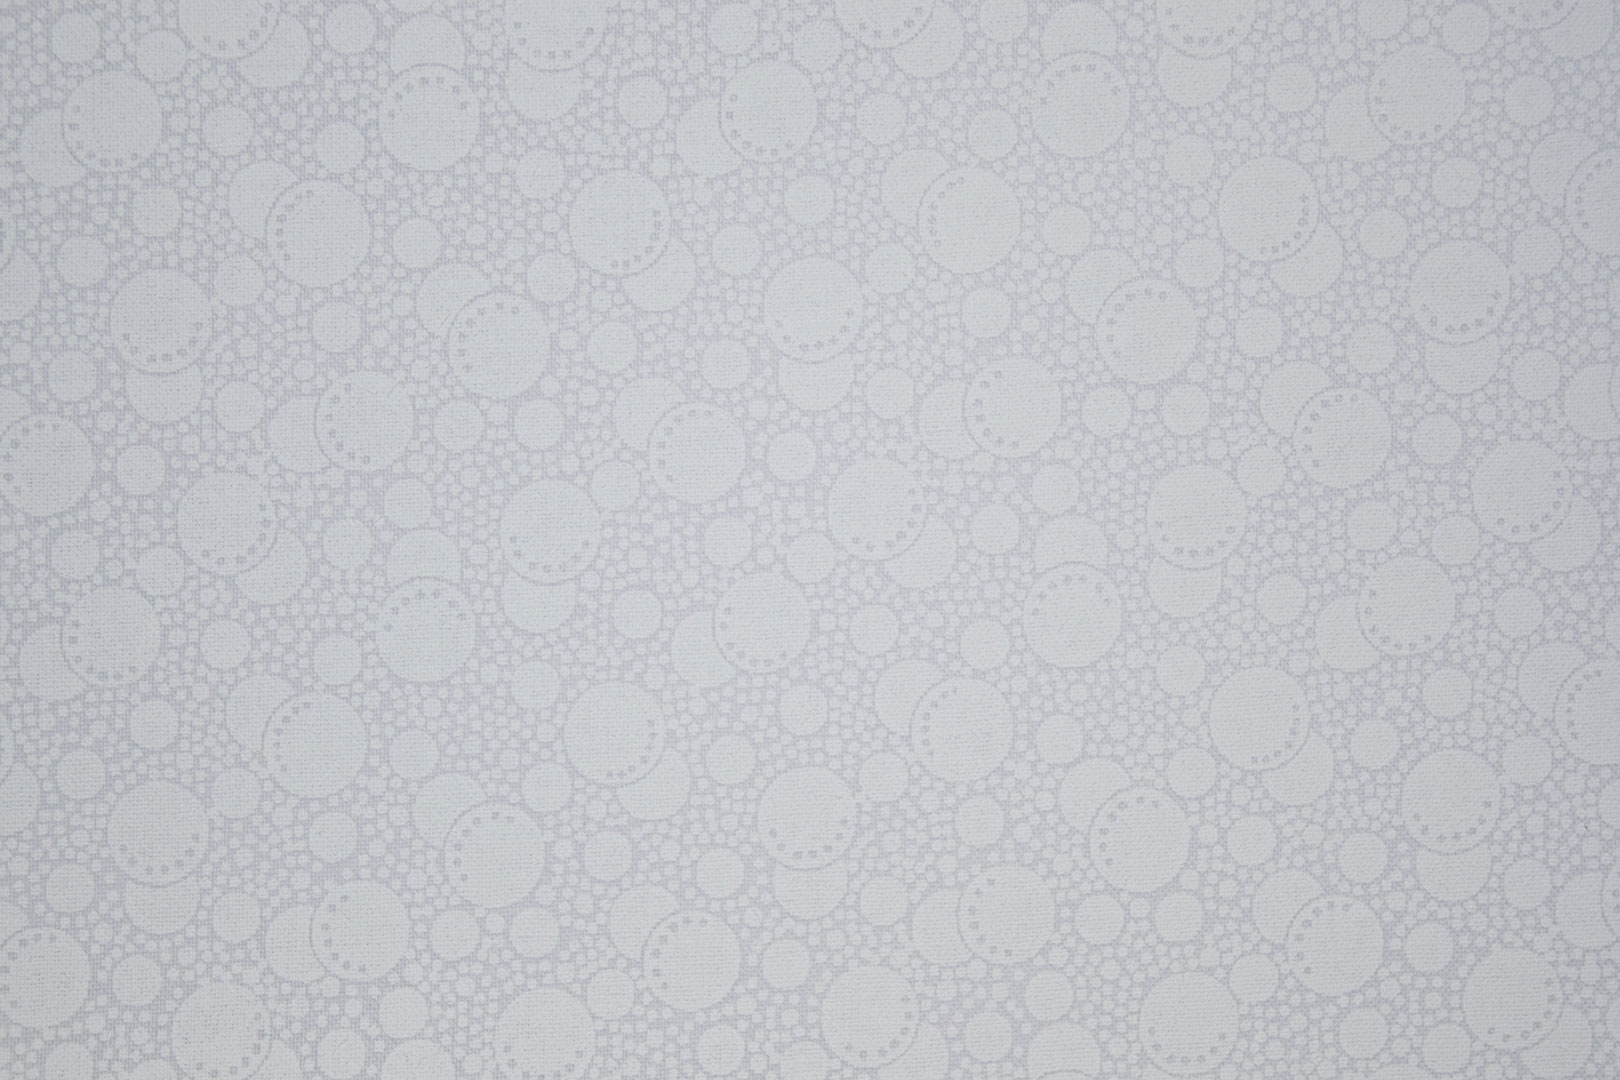 "149_47748_ww   45"" 68/68, 100% Carded Cotton"